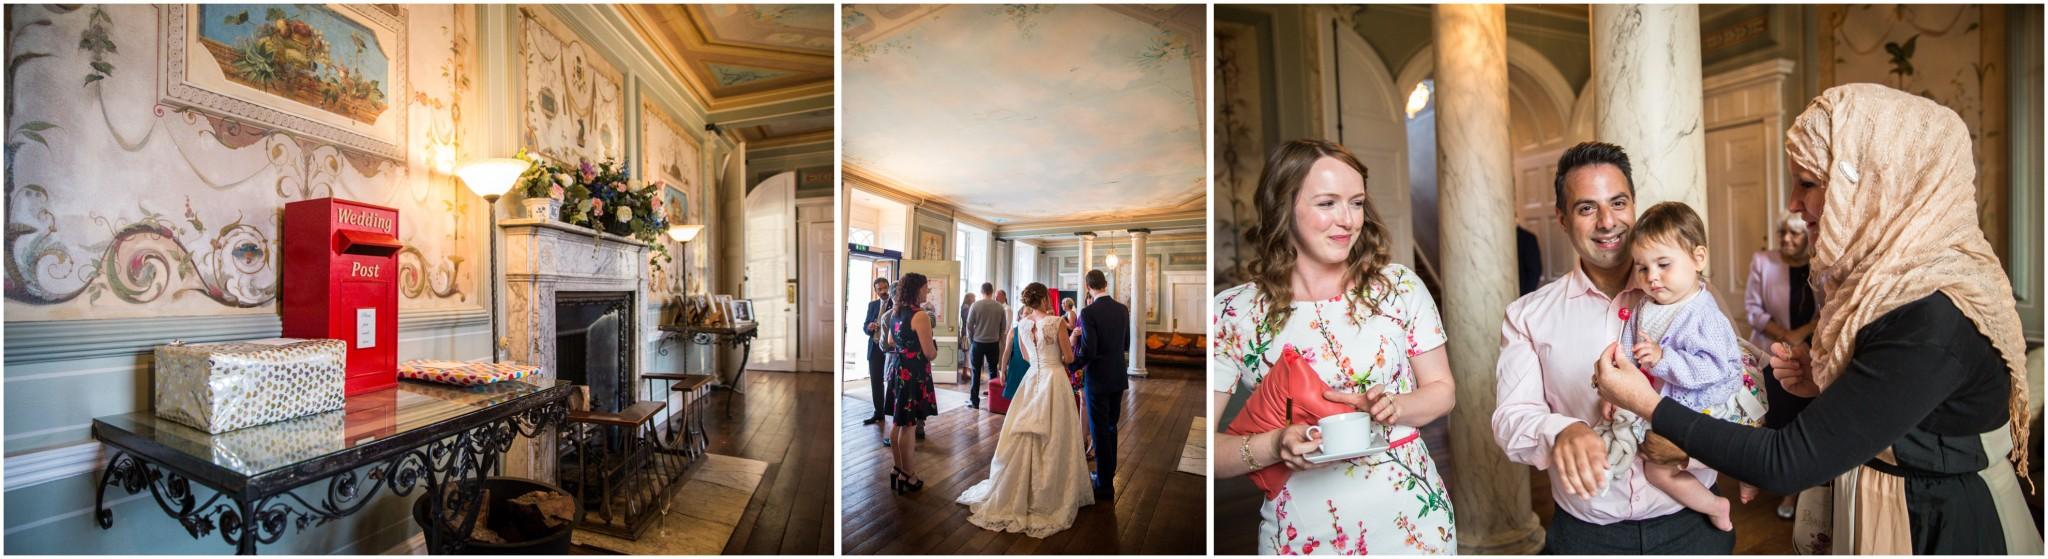 Avington Park Wedding Evening Reception Guests arriving